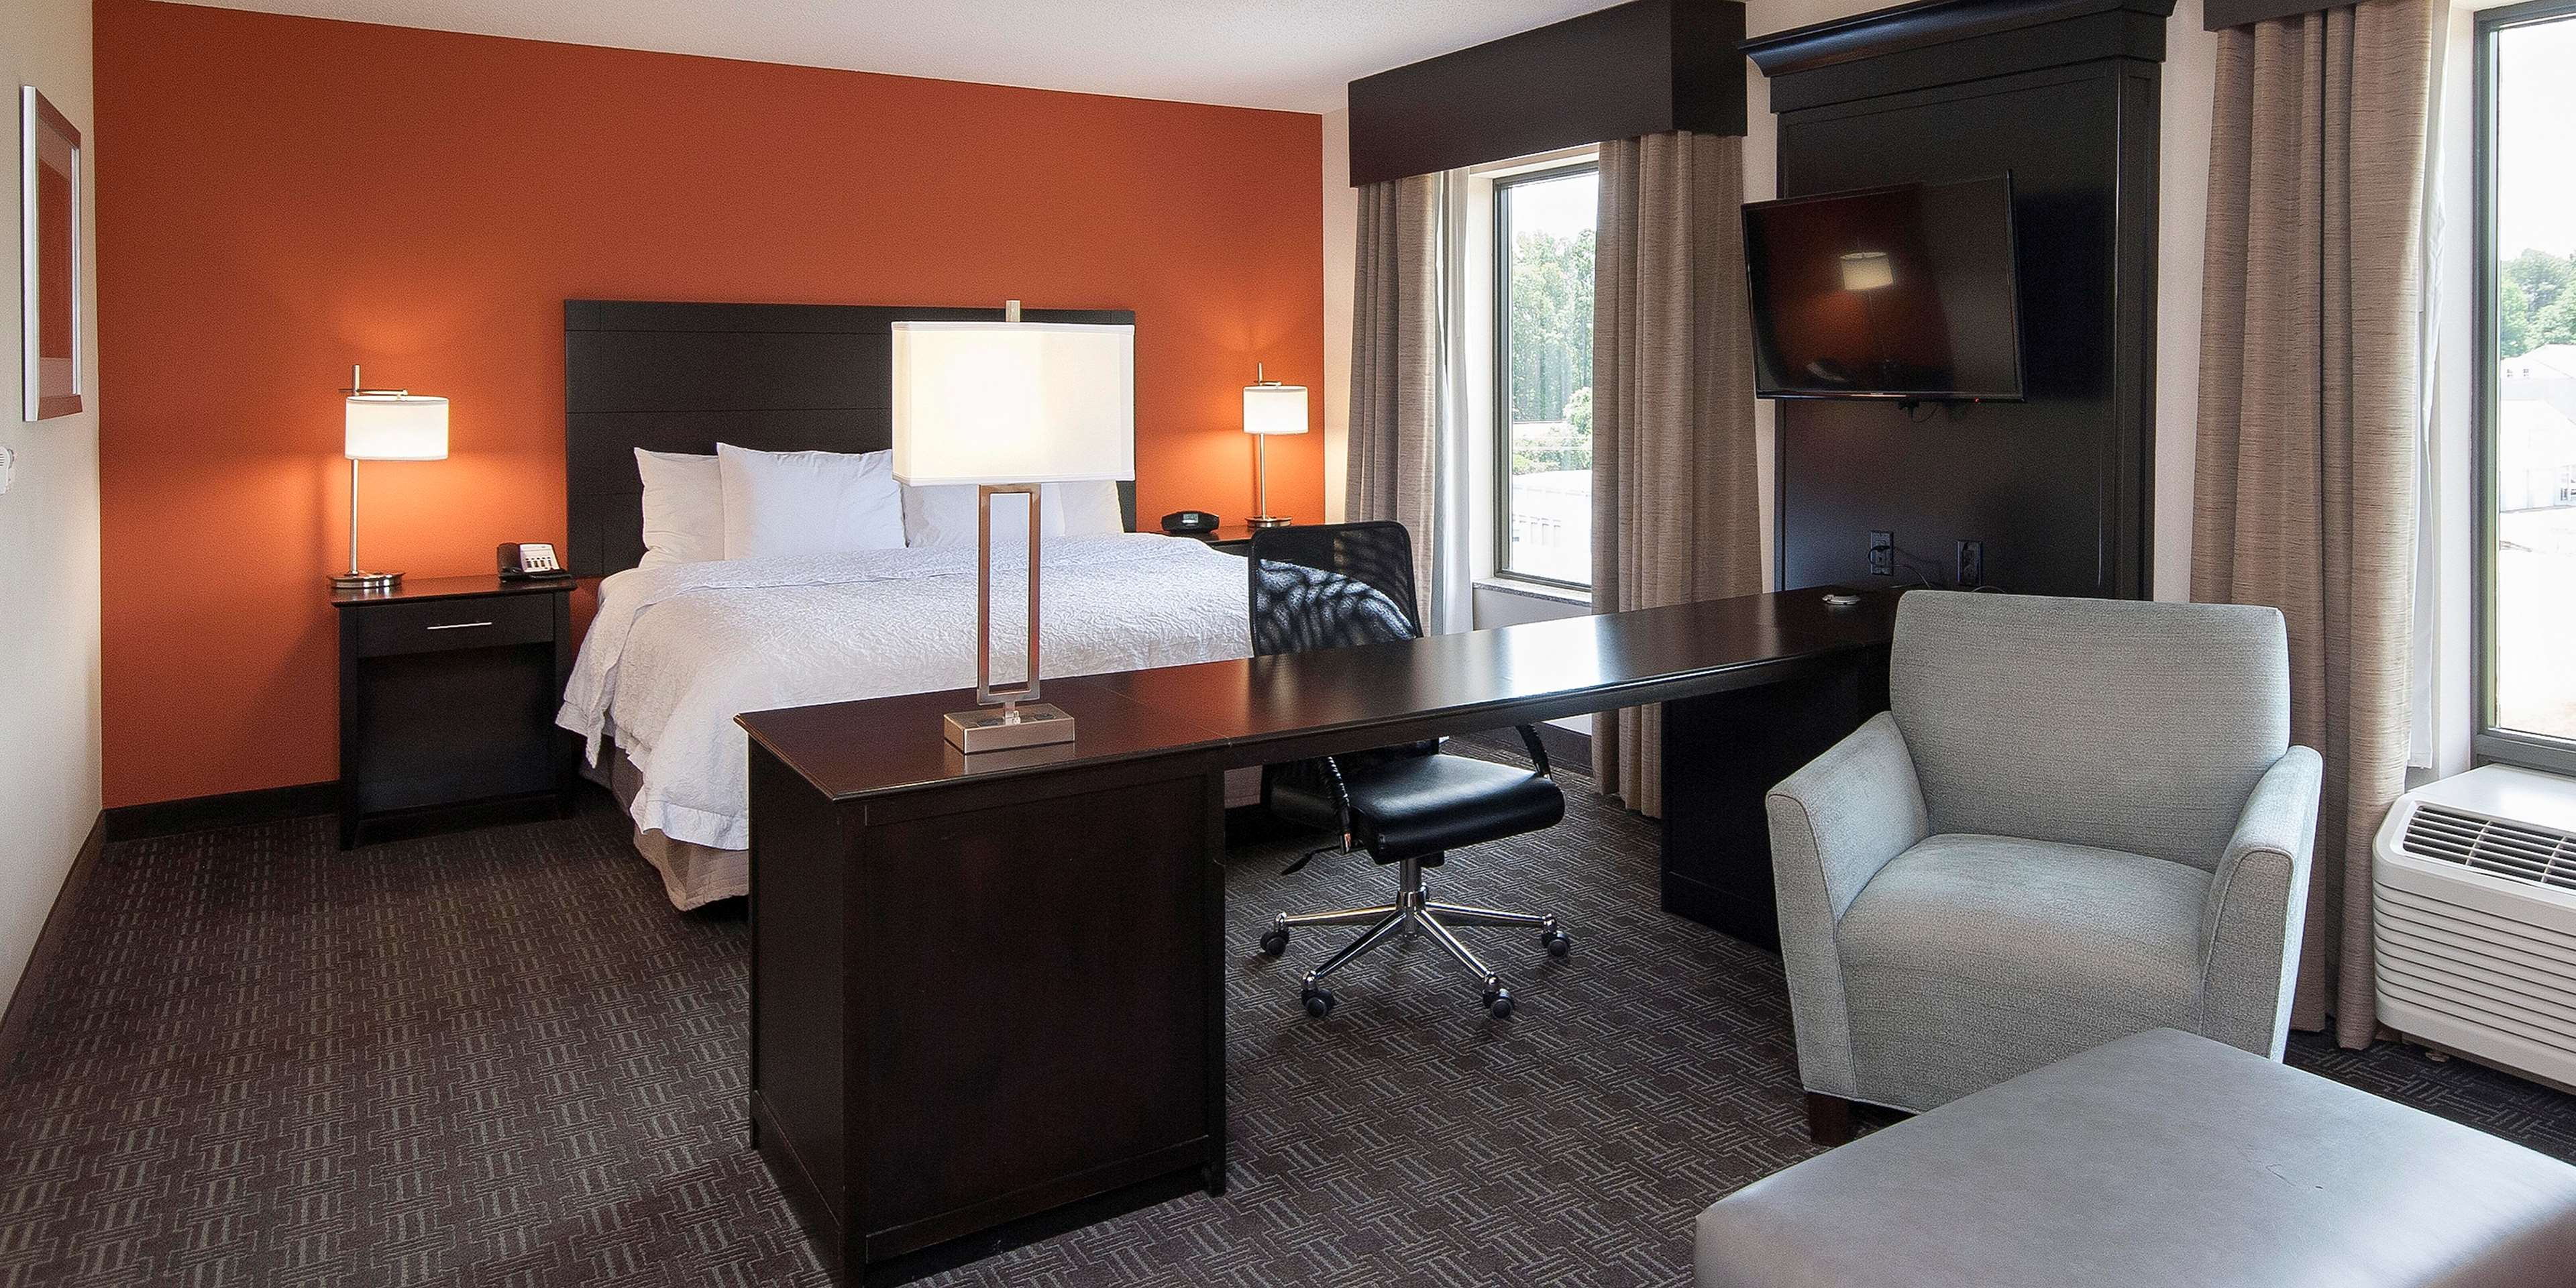 Hampton Inn & Suites Seneca-Clemson Area image 30